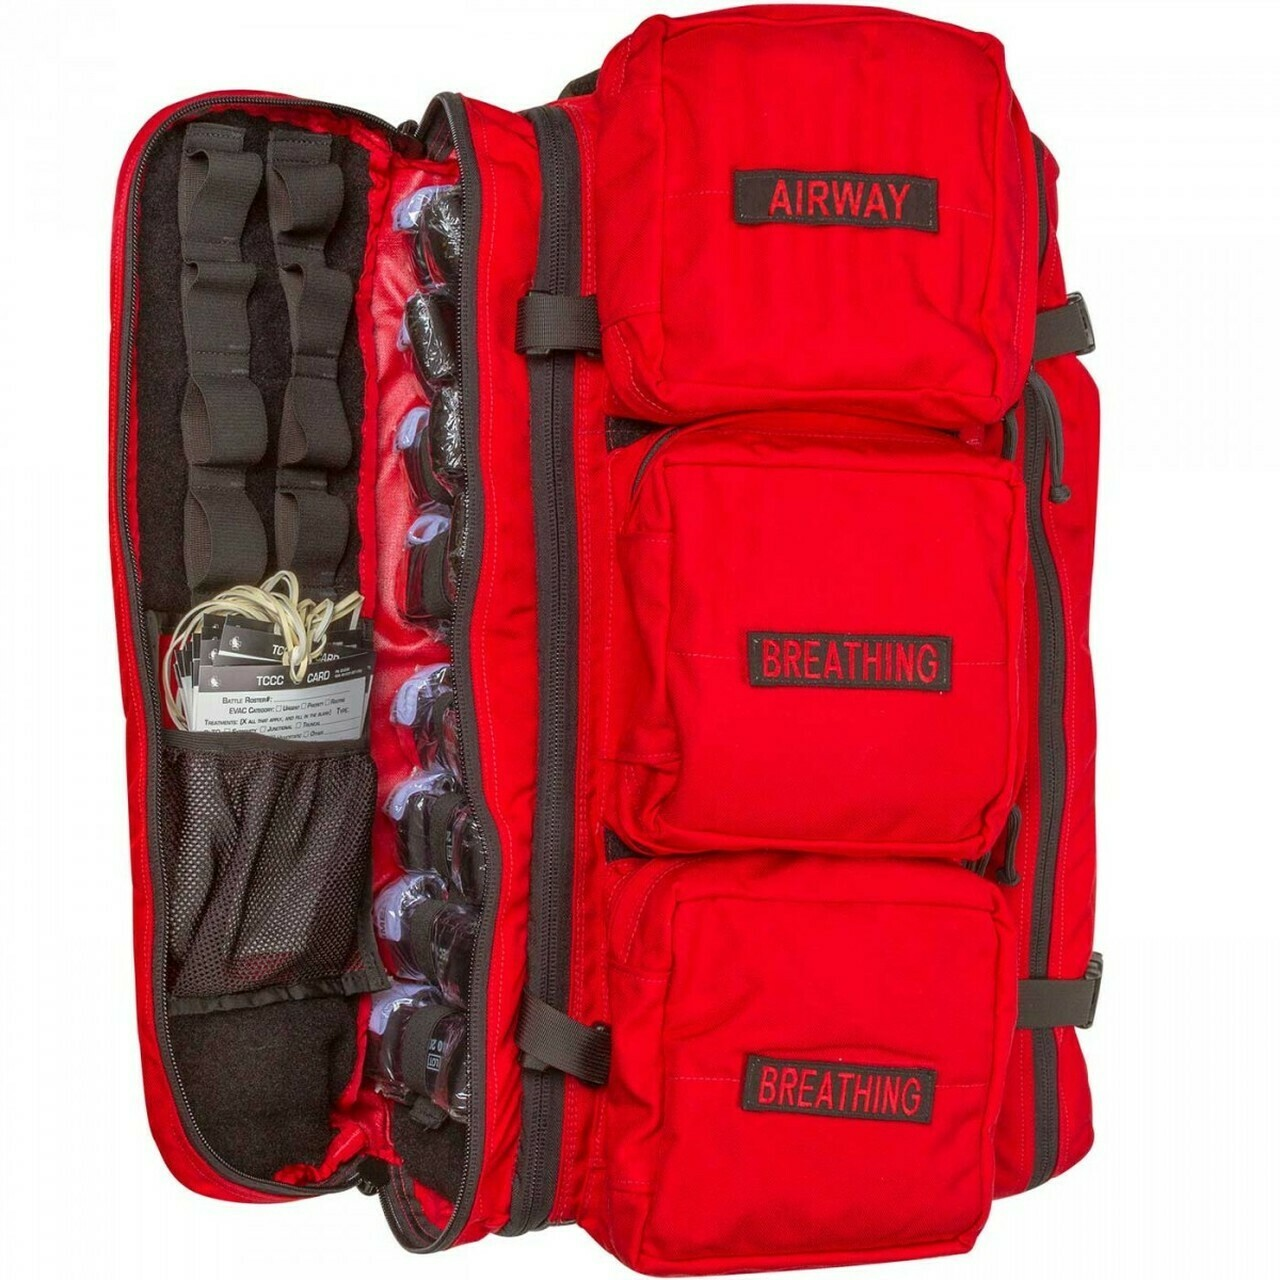 MCI Walk Kit, RED or BLACK (w MedEVAC Litter)